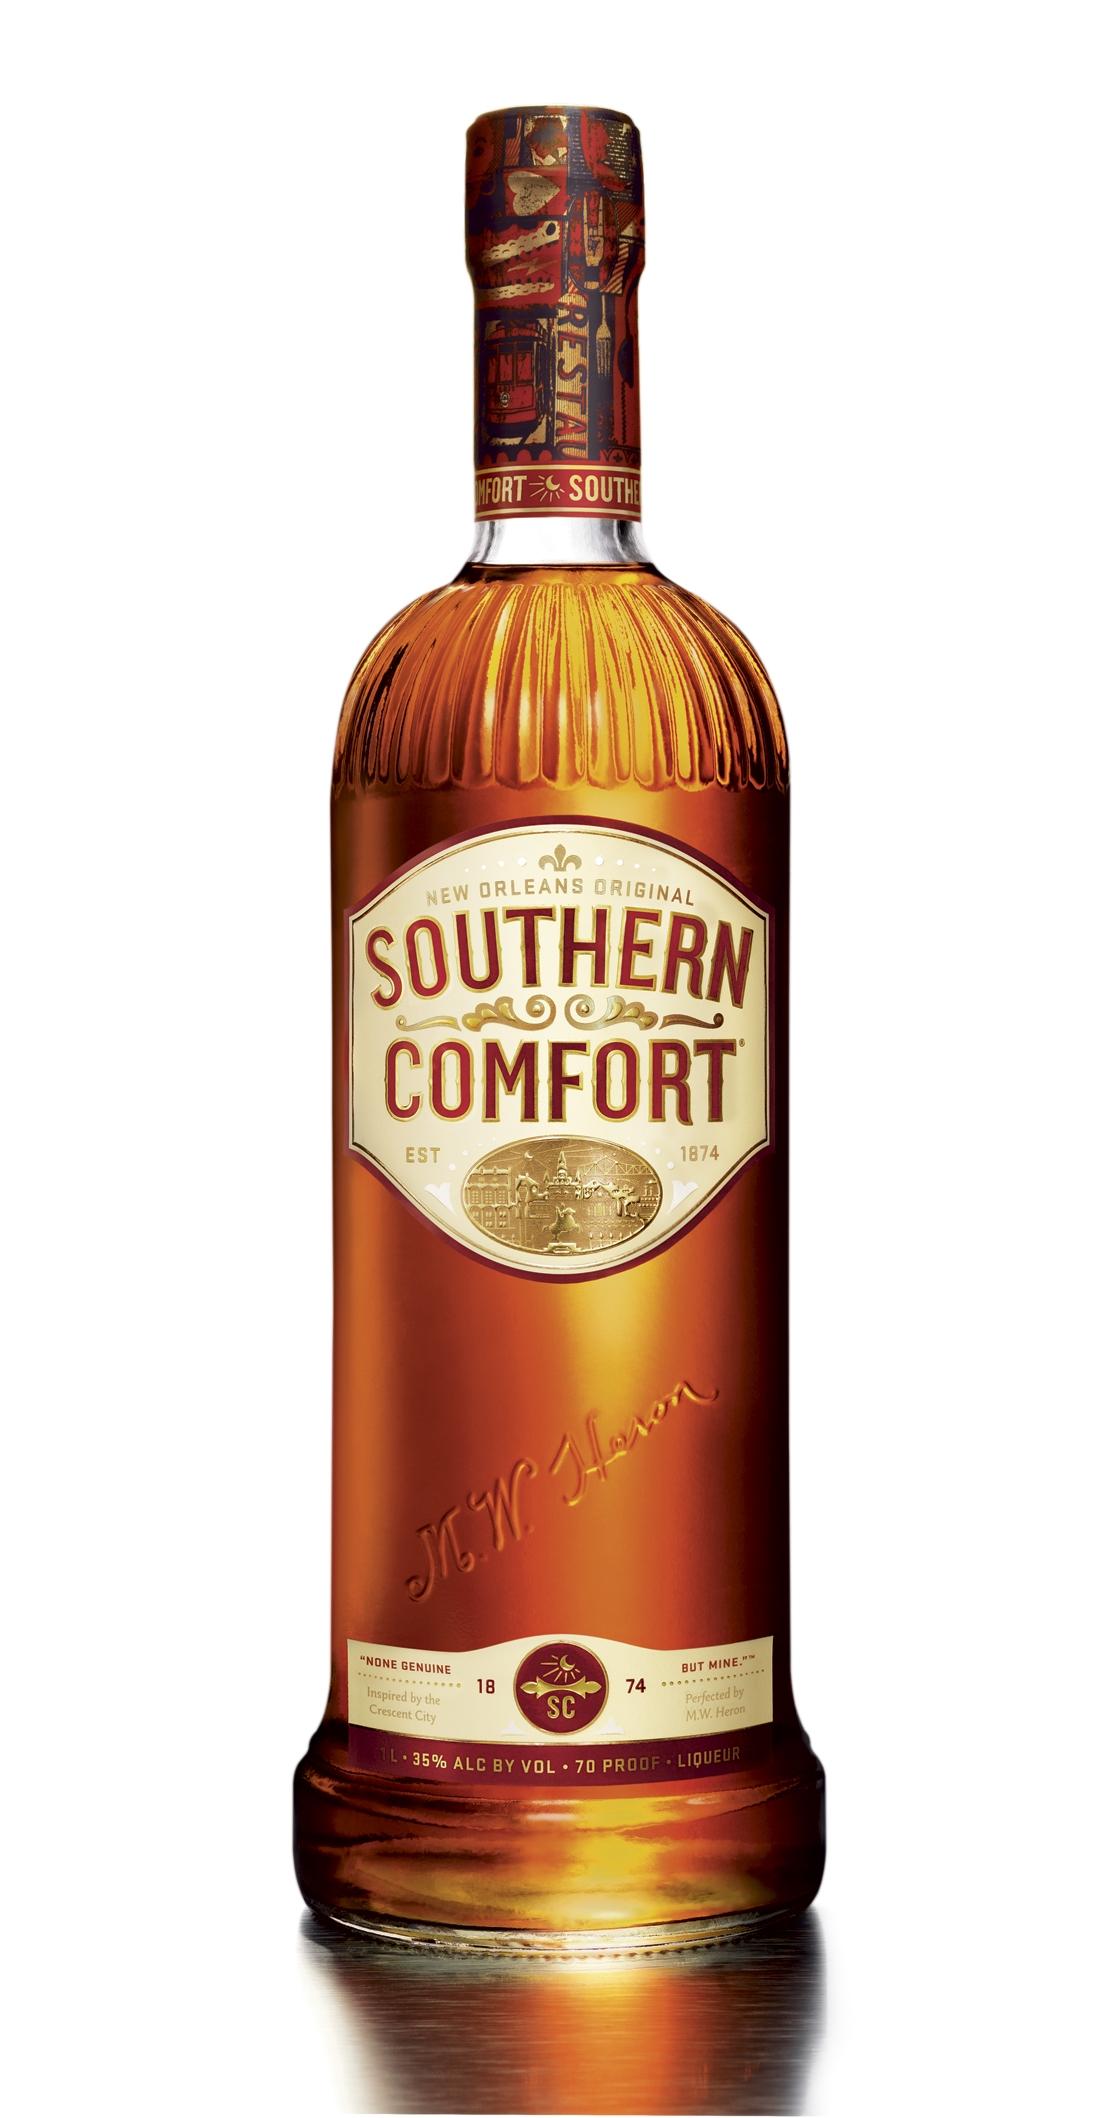 Getting Comfy Southern Style The Santa Fe Barman